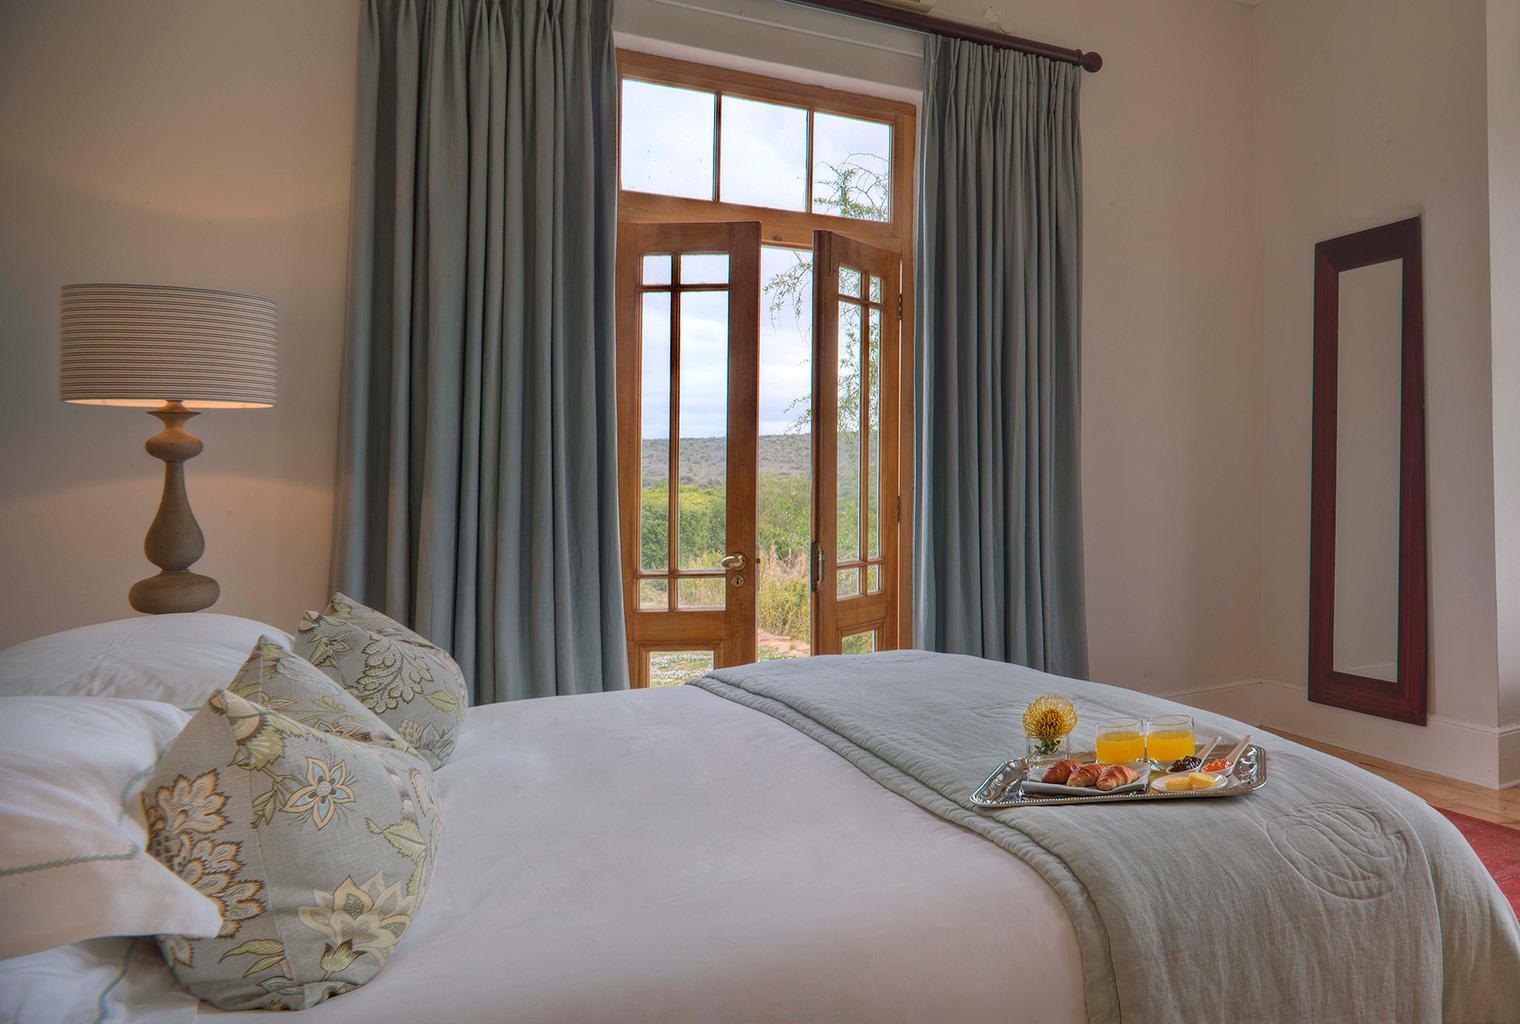 Uplands-Homestead-South-Africa-Bedroom-2